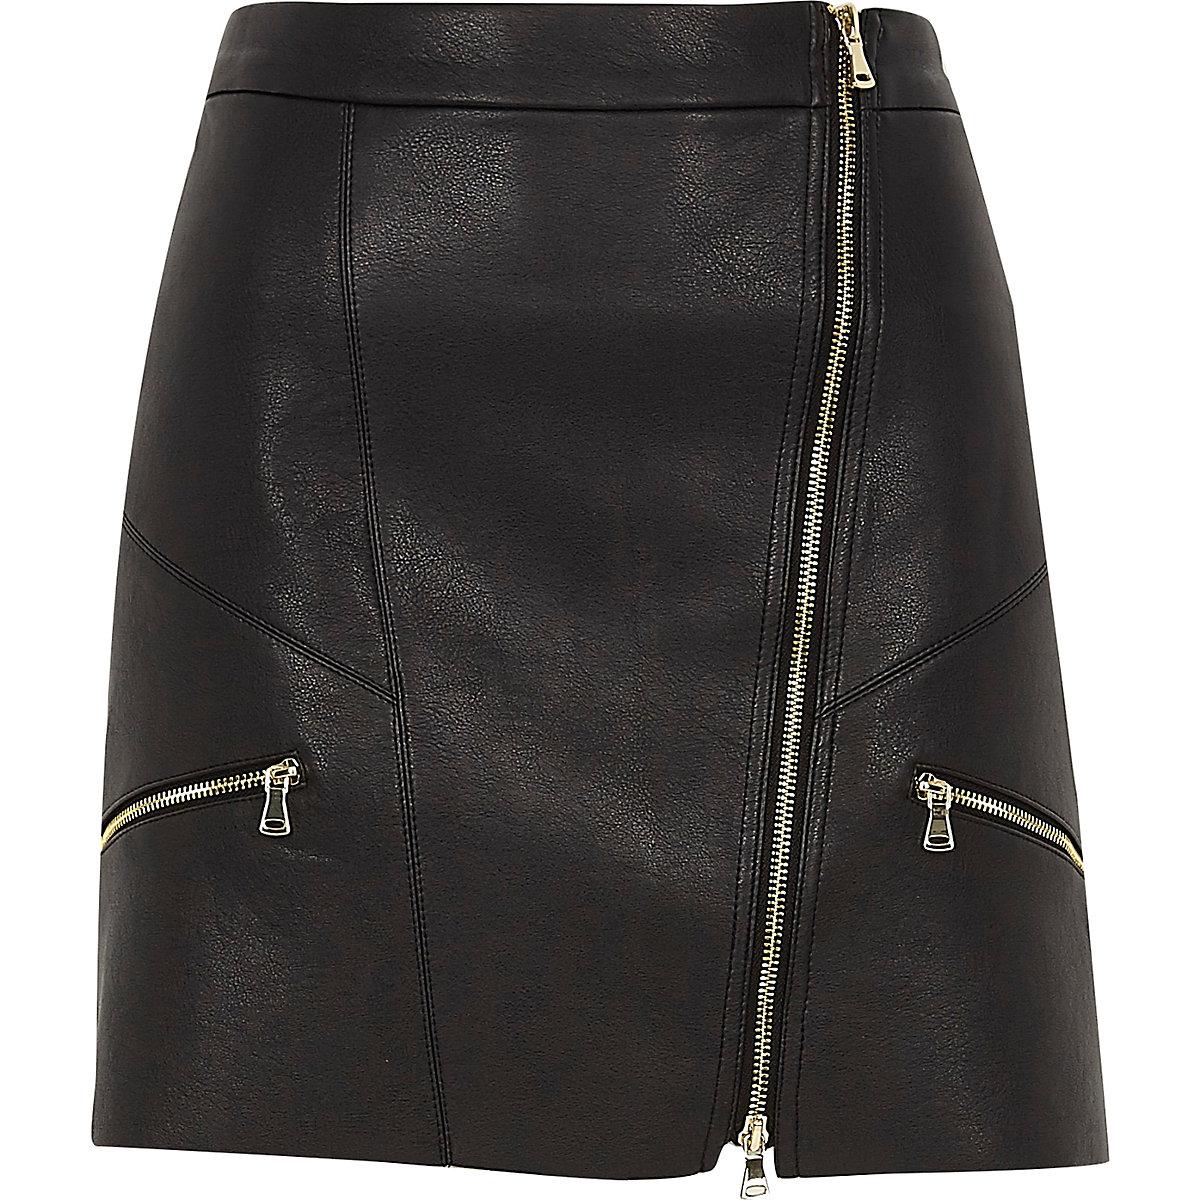 Black faux leather zip front mini skirt